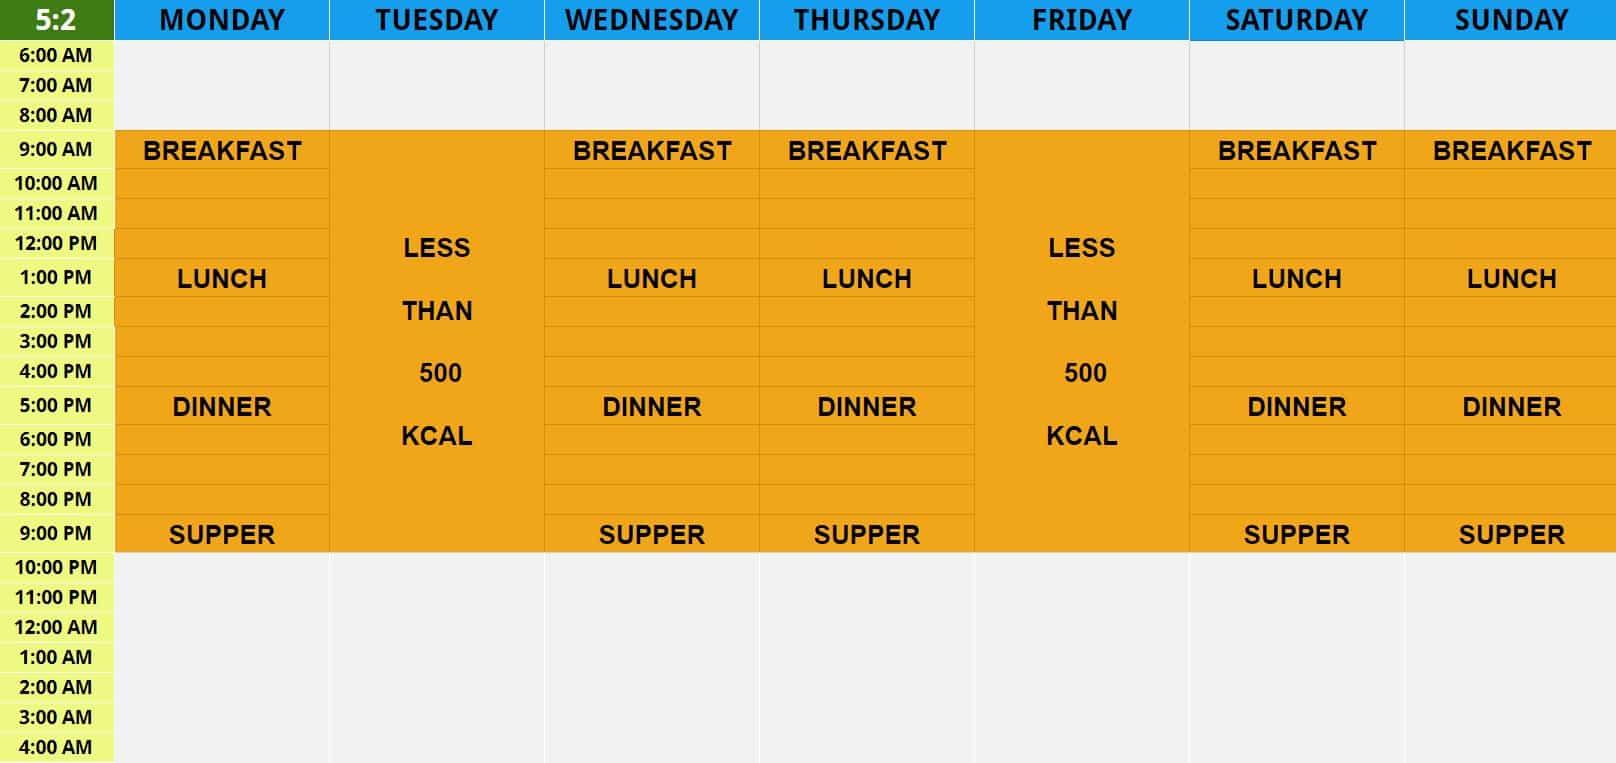 5:2 diet, 5:2 intermittent fasting, intermittent fasting protocols, types of intermittent fasting protocols,